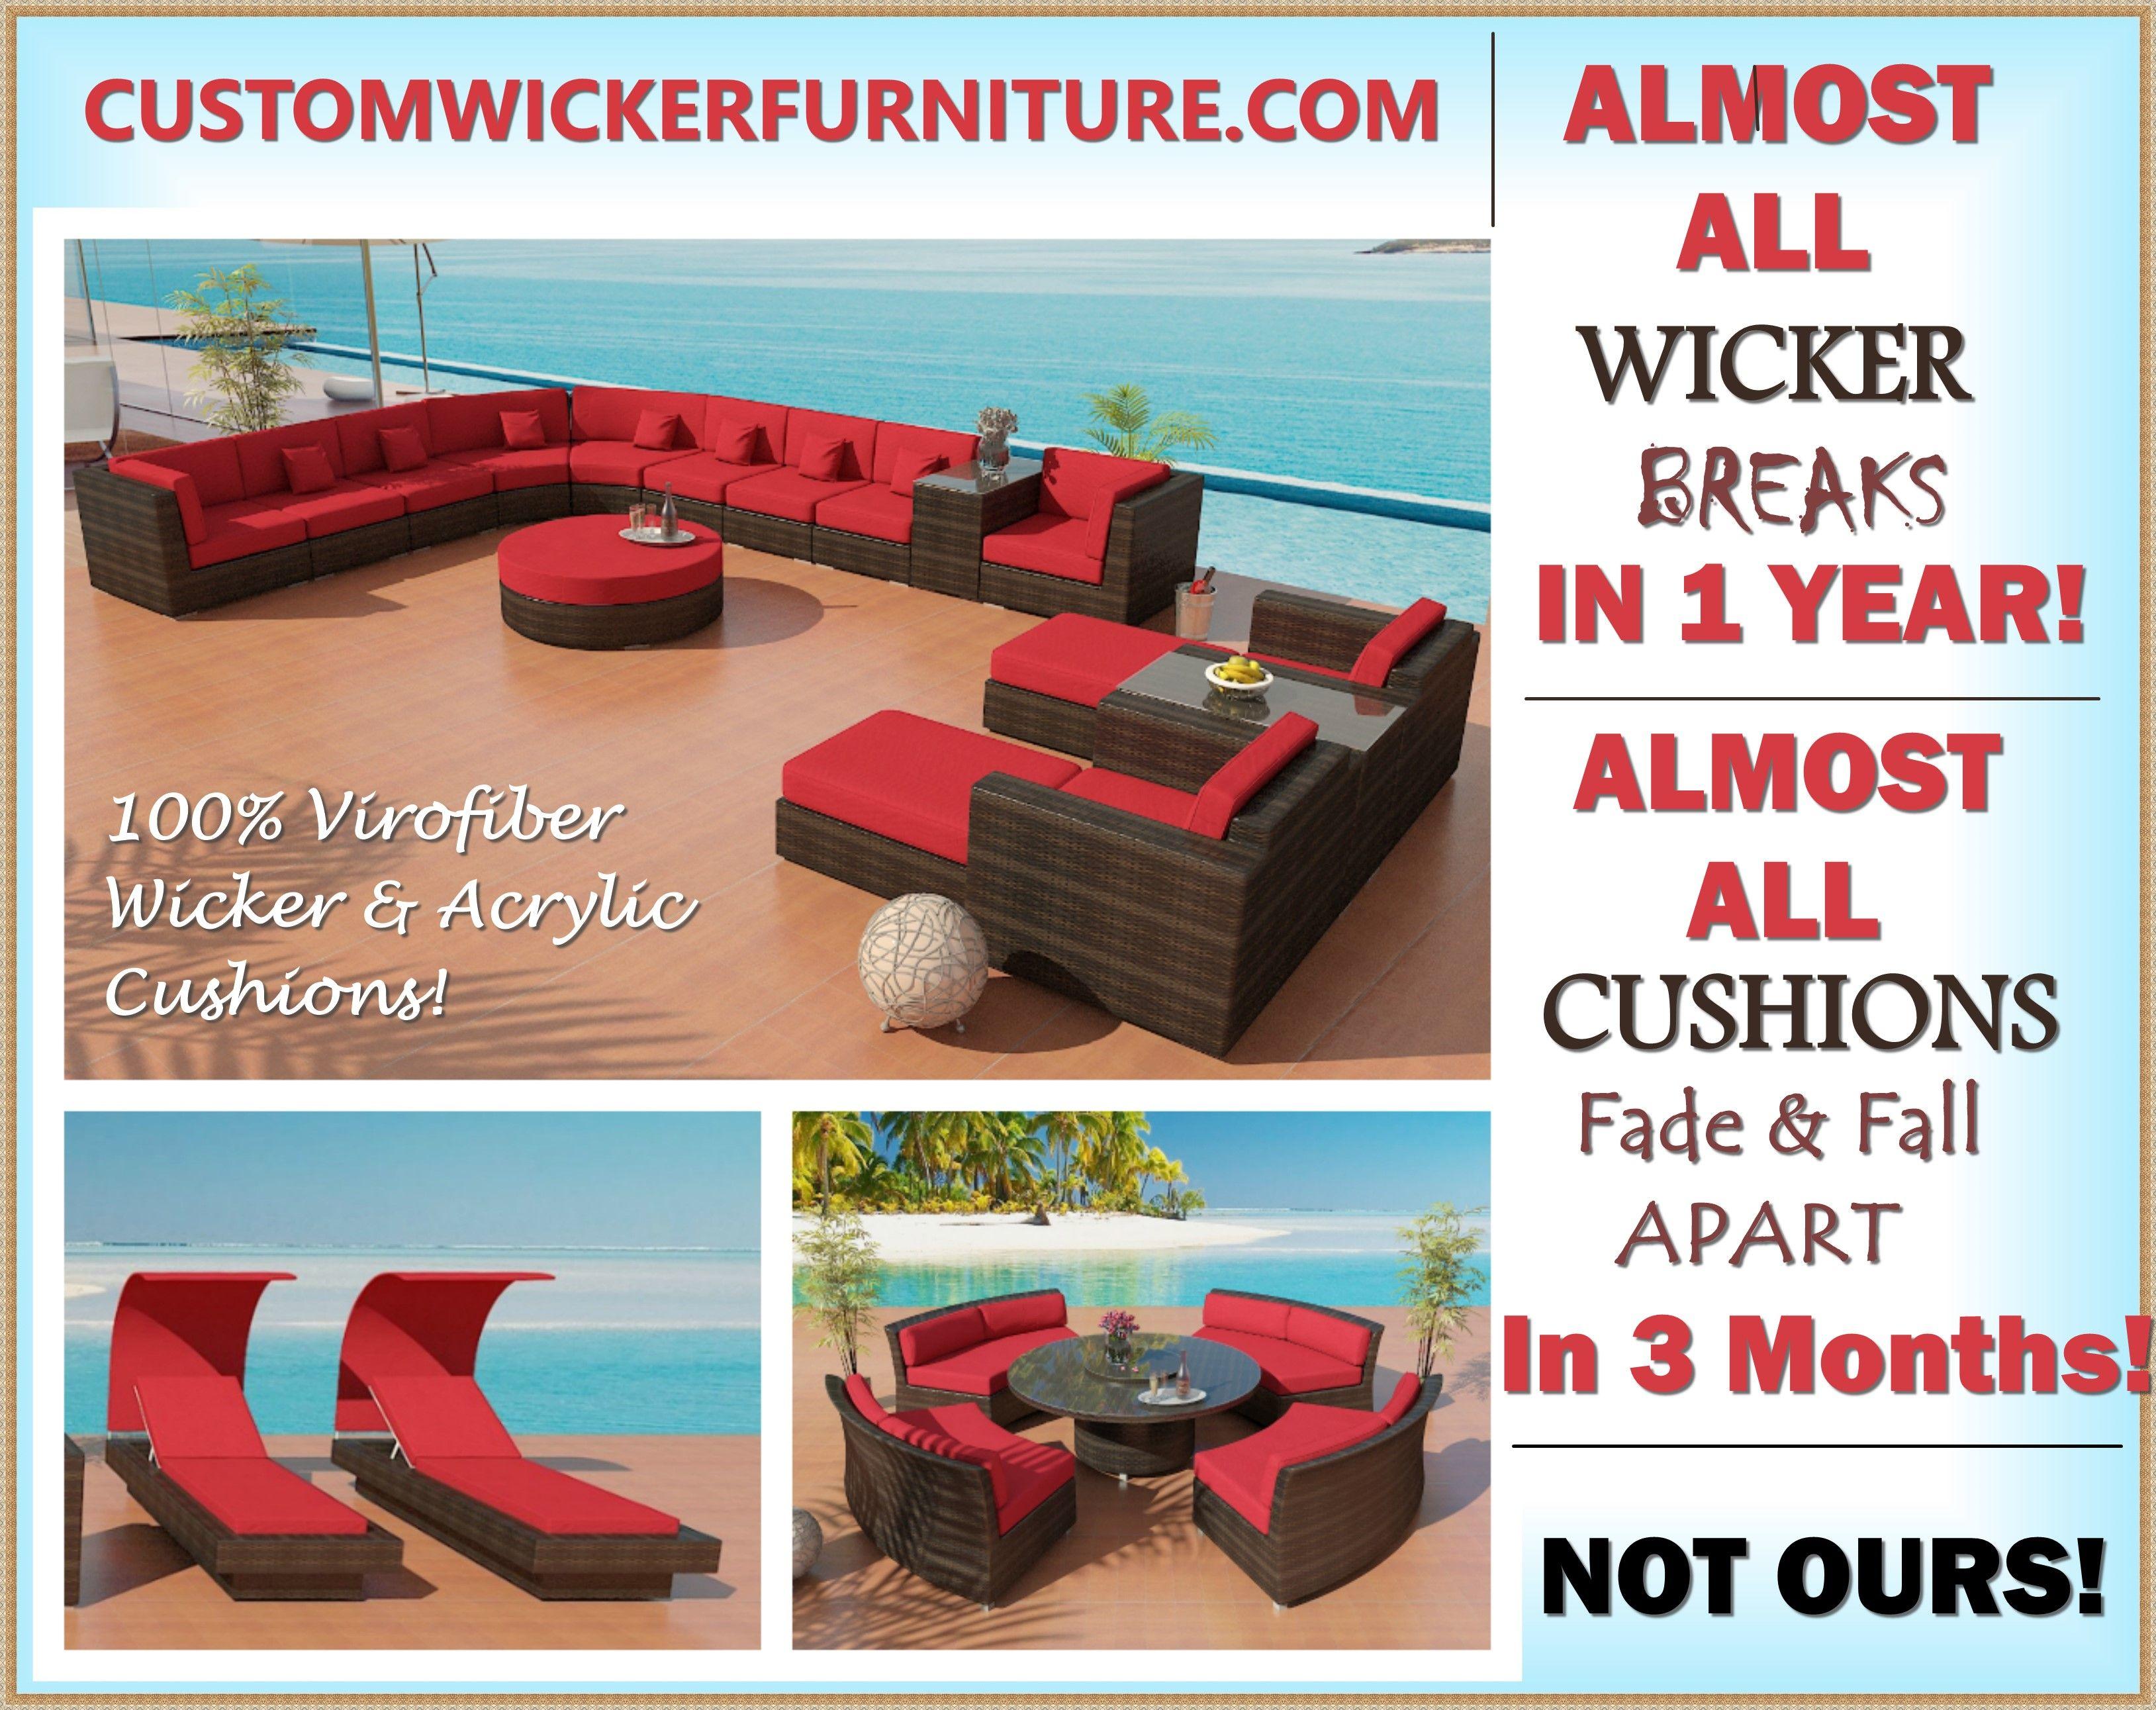 Wholesale Wicker Patio Furniture Www Customwickerfurniture Com